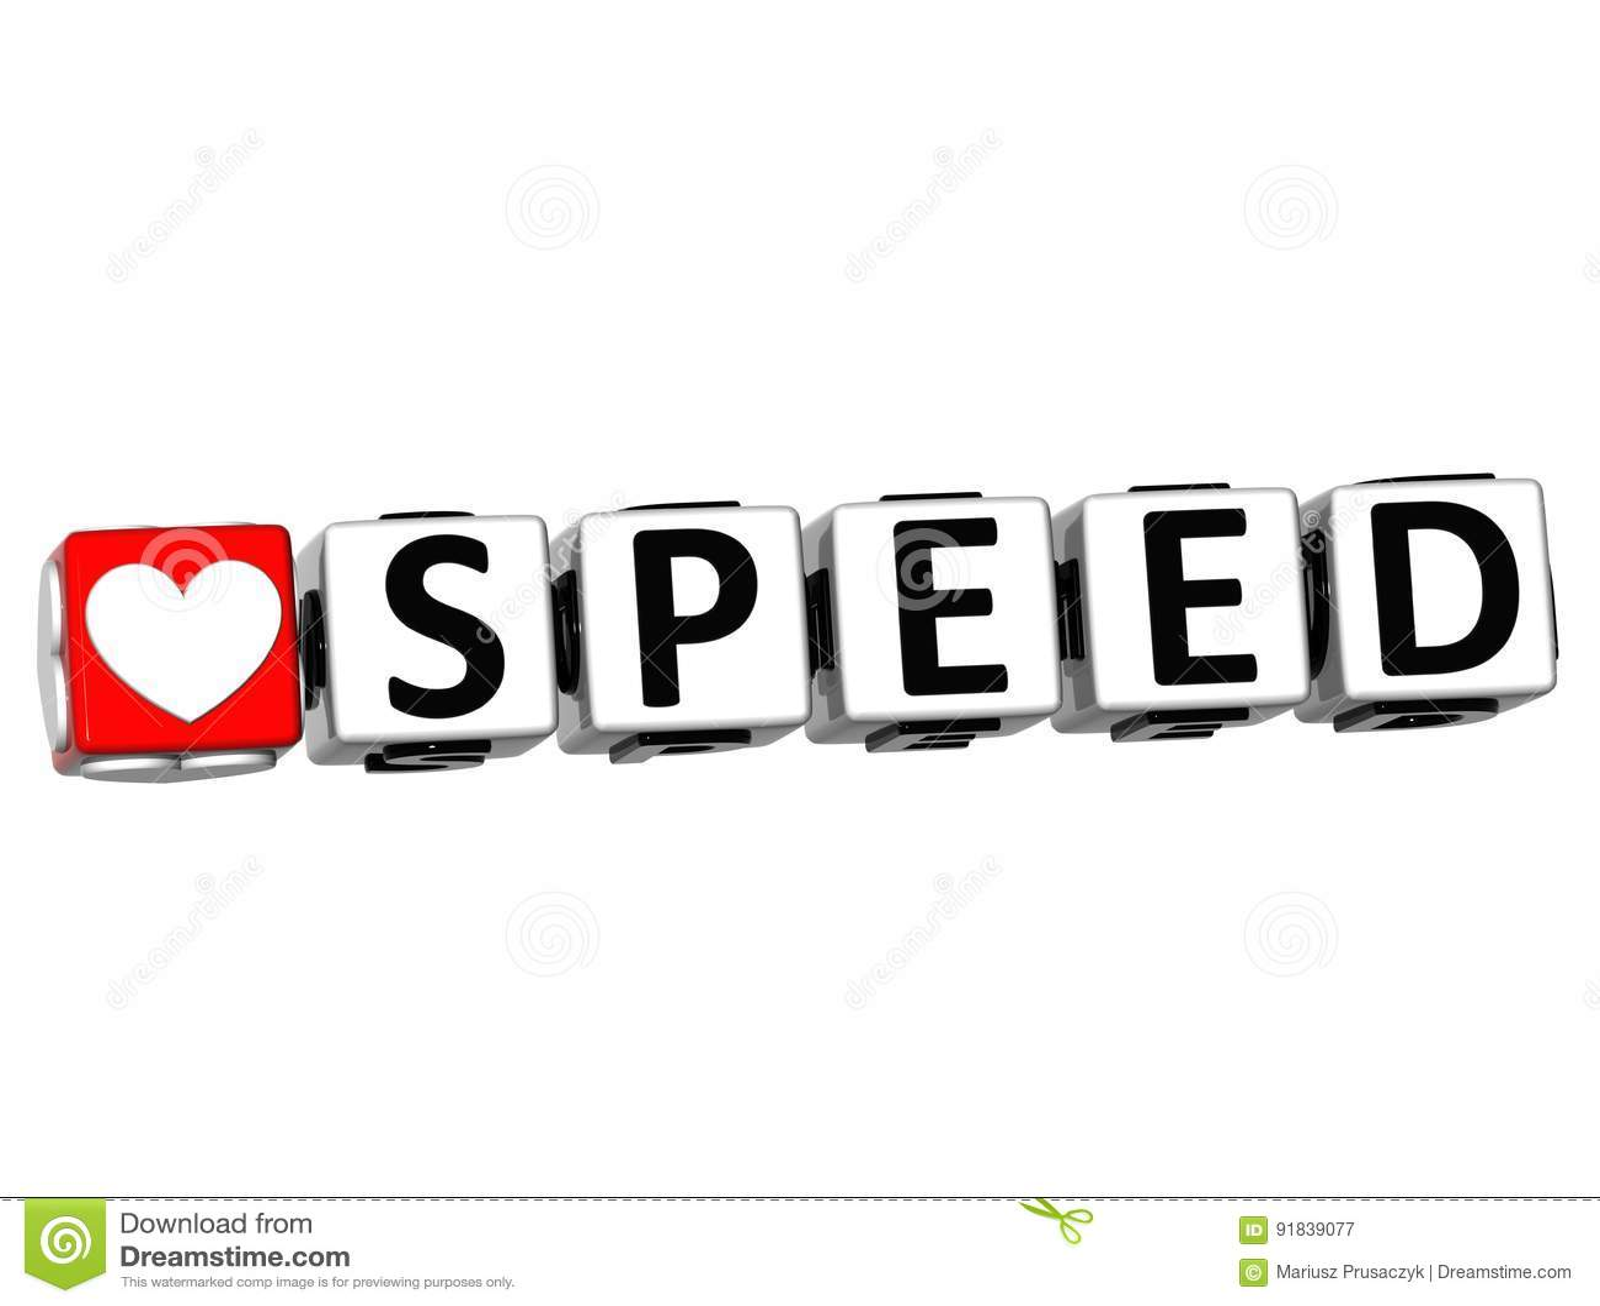 speed click